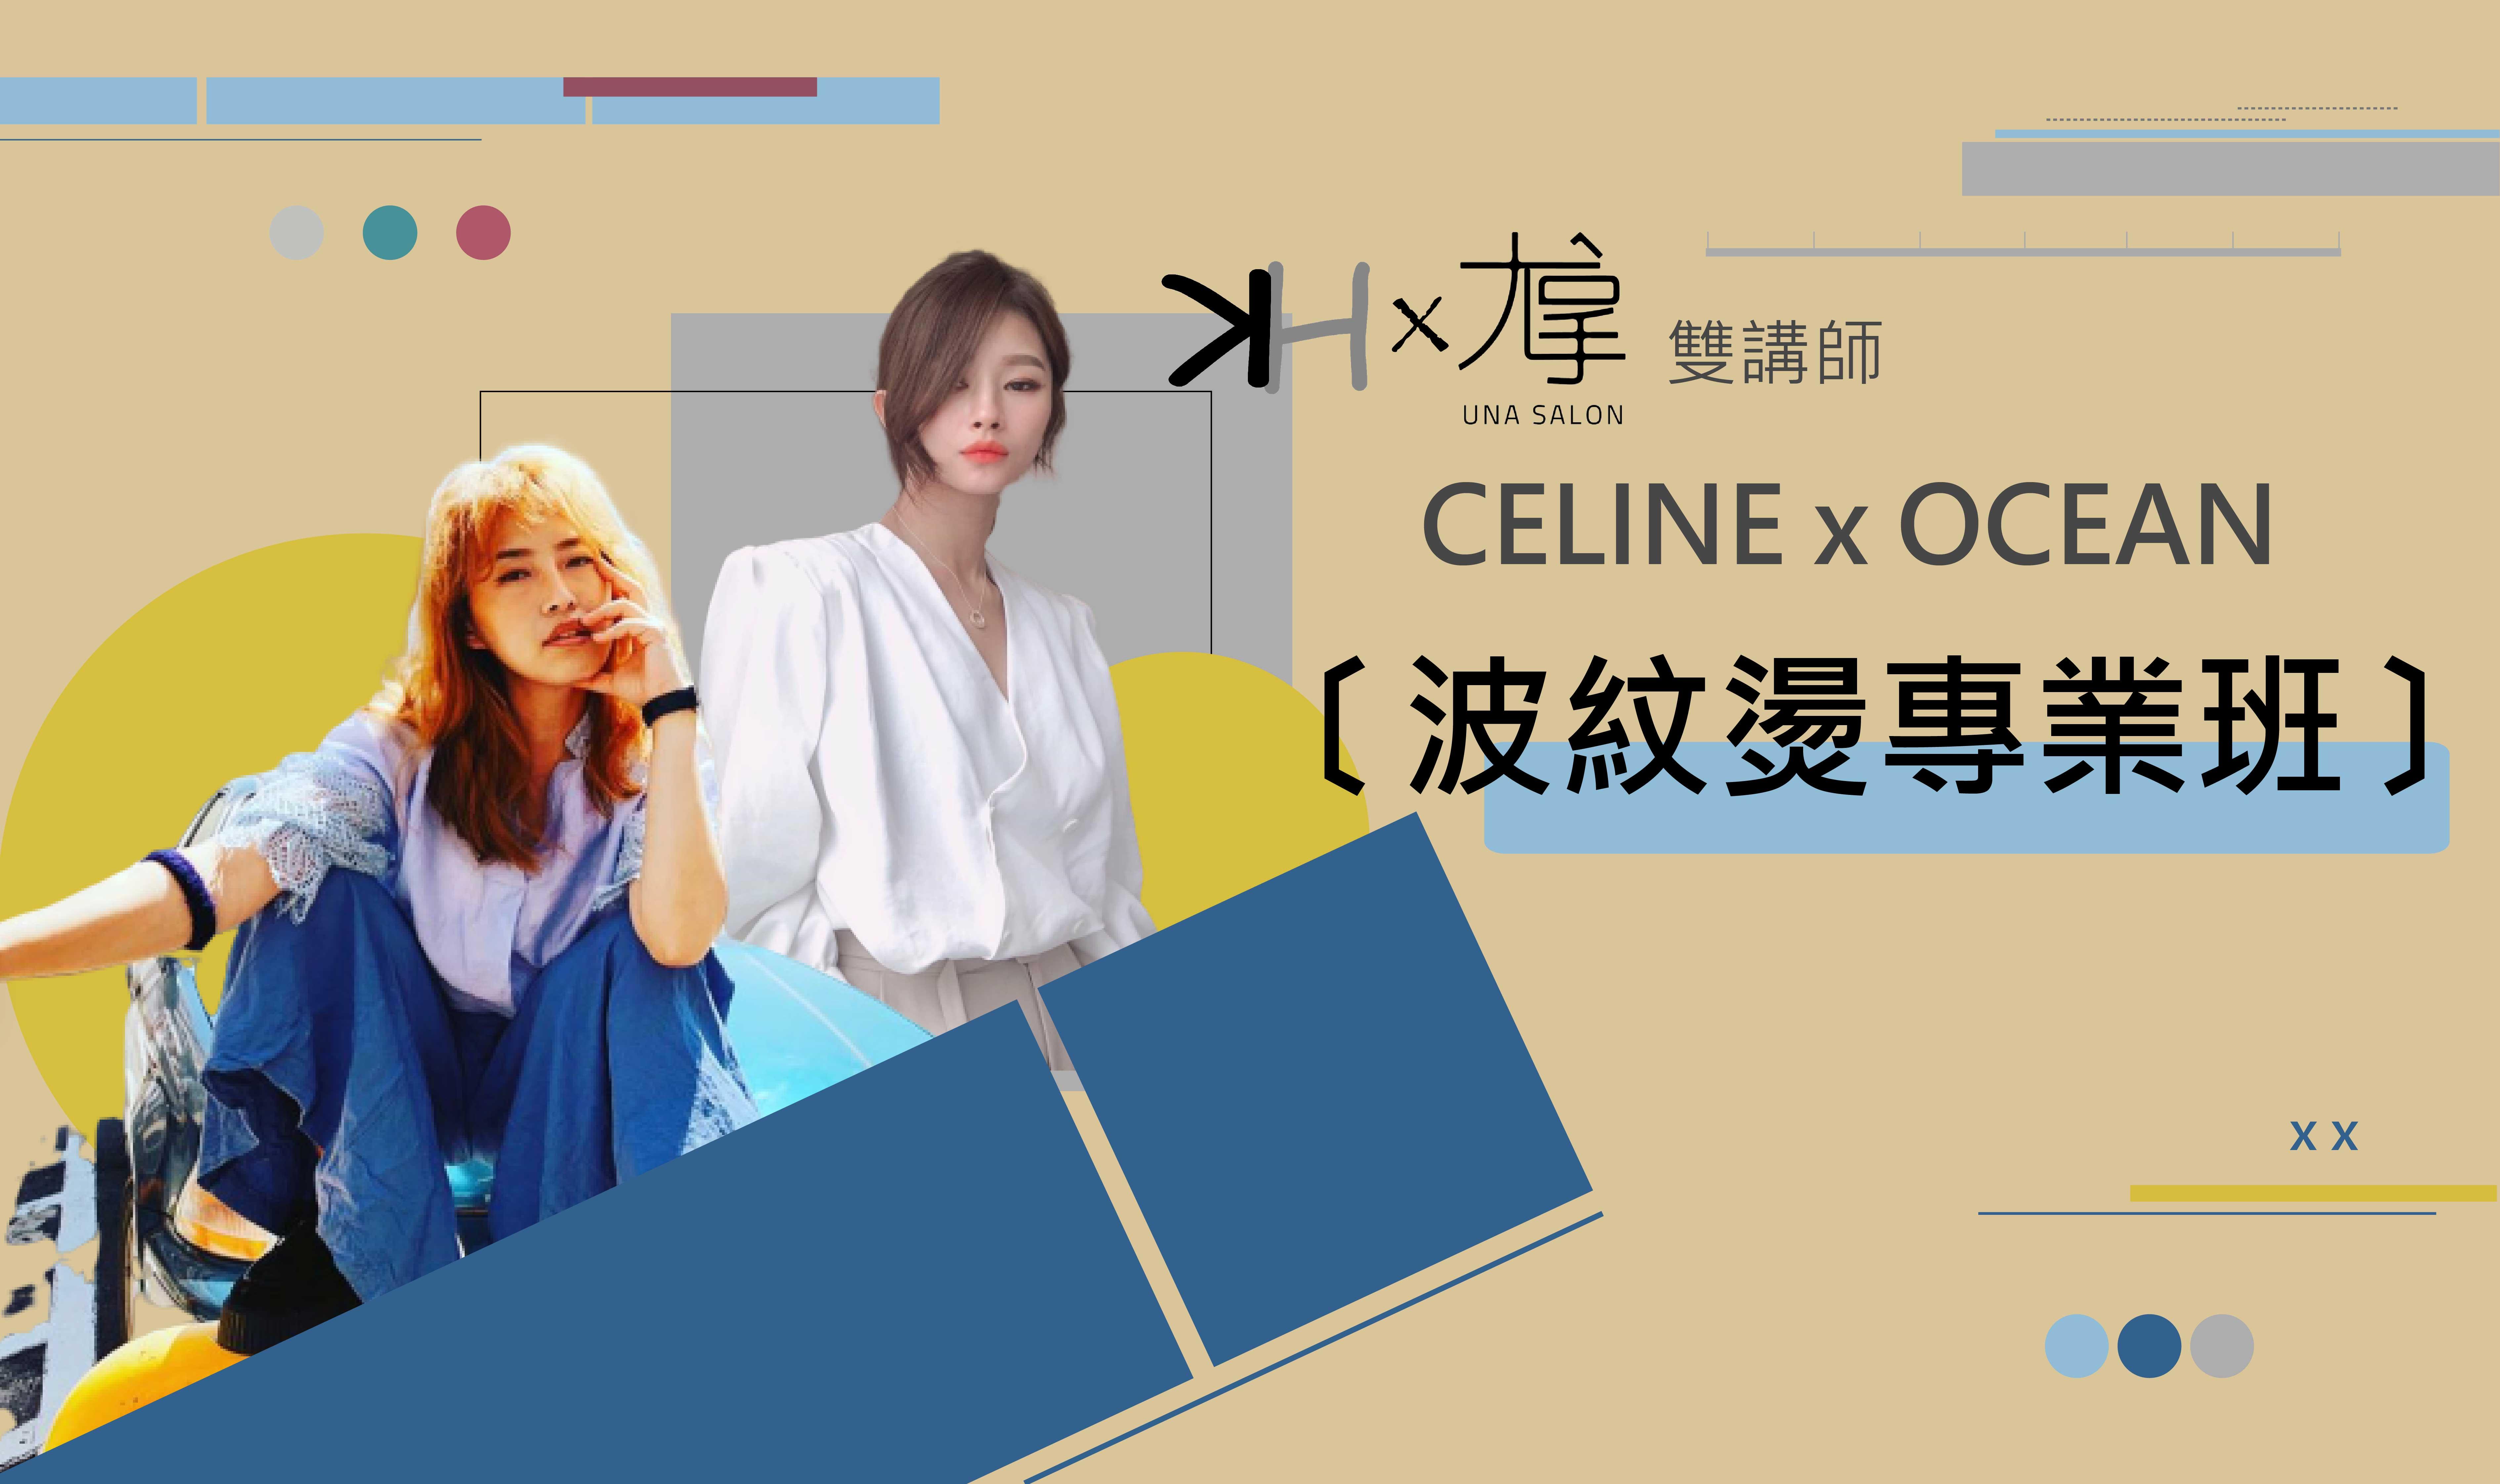 KH x 尤拿 Celine x 牛牛 波紋燙專業班